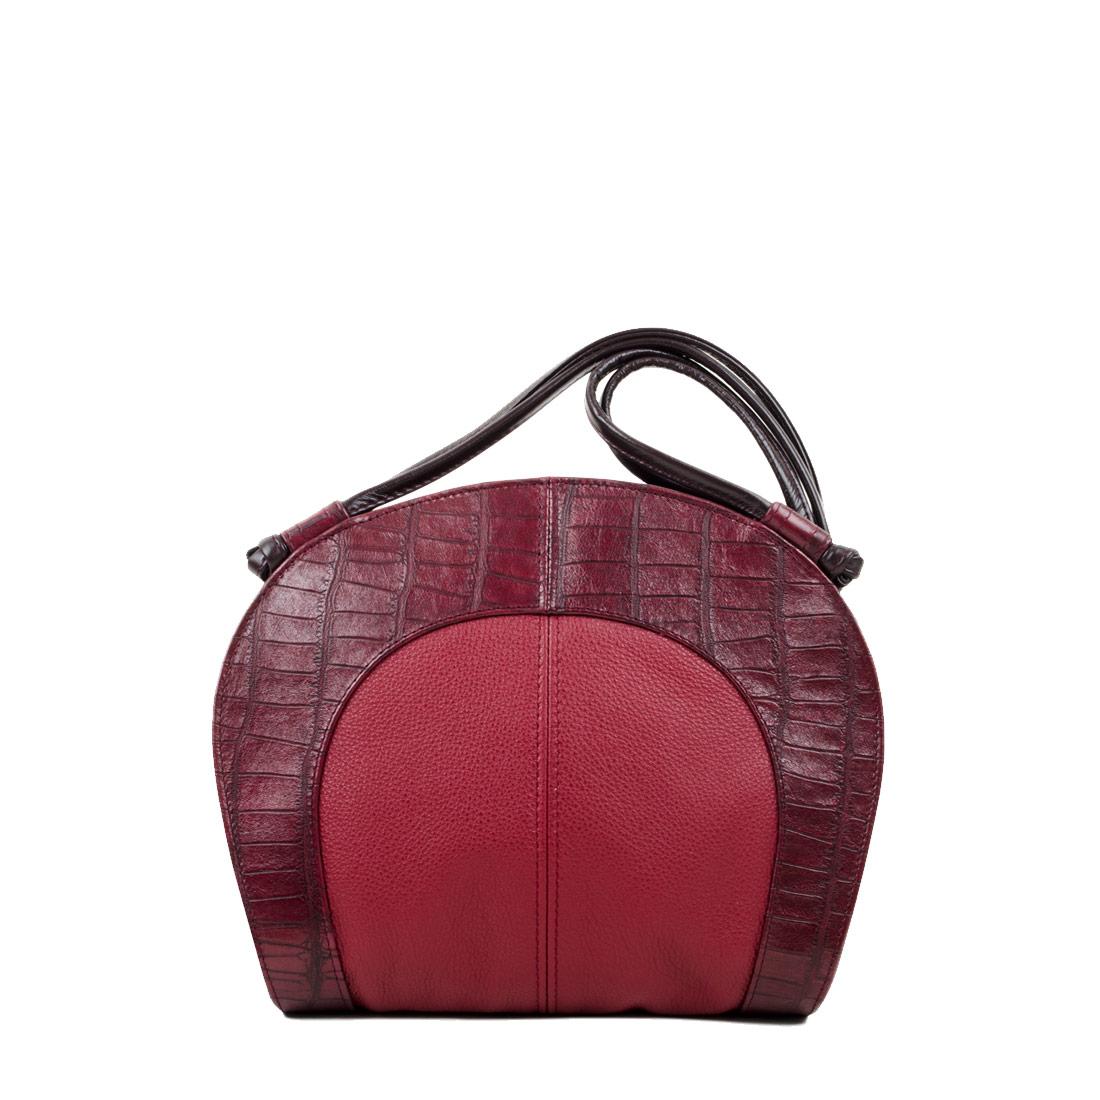 Molly Red crocodile Print Leather Shoulder Bag